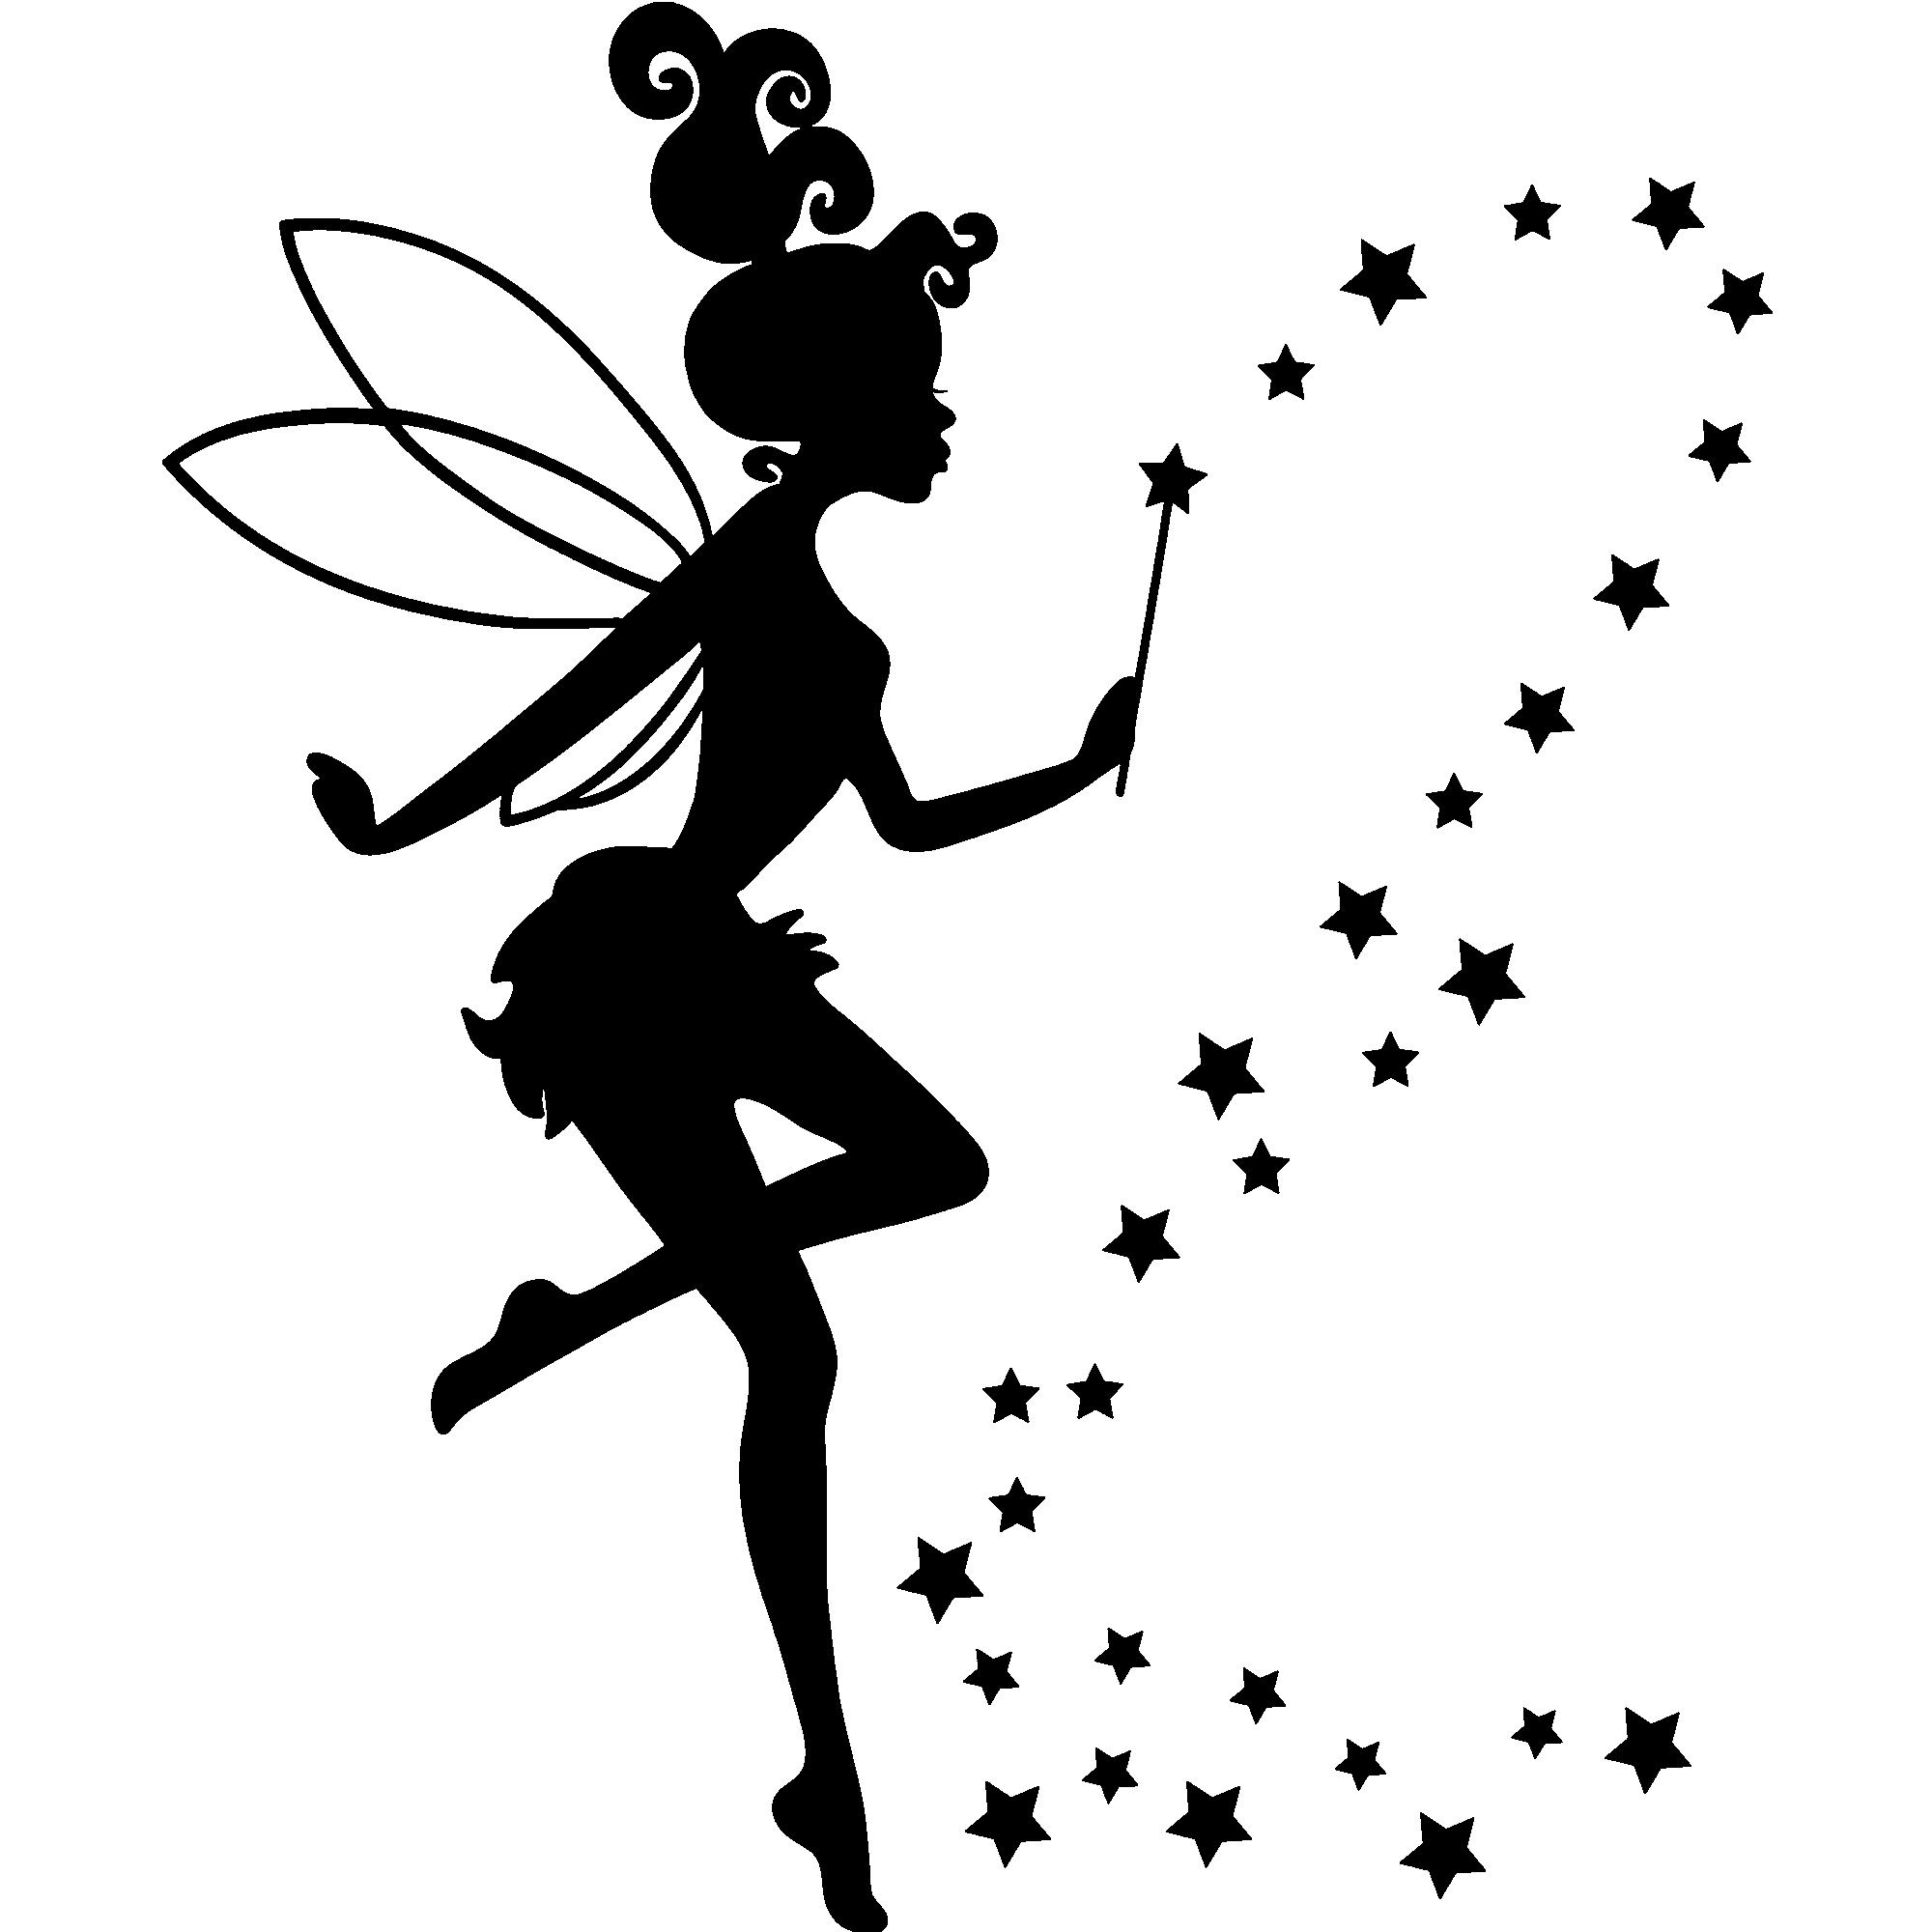 Sticker Mademoiselle la fée – Stickers Filles Fées Ambiance sticker